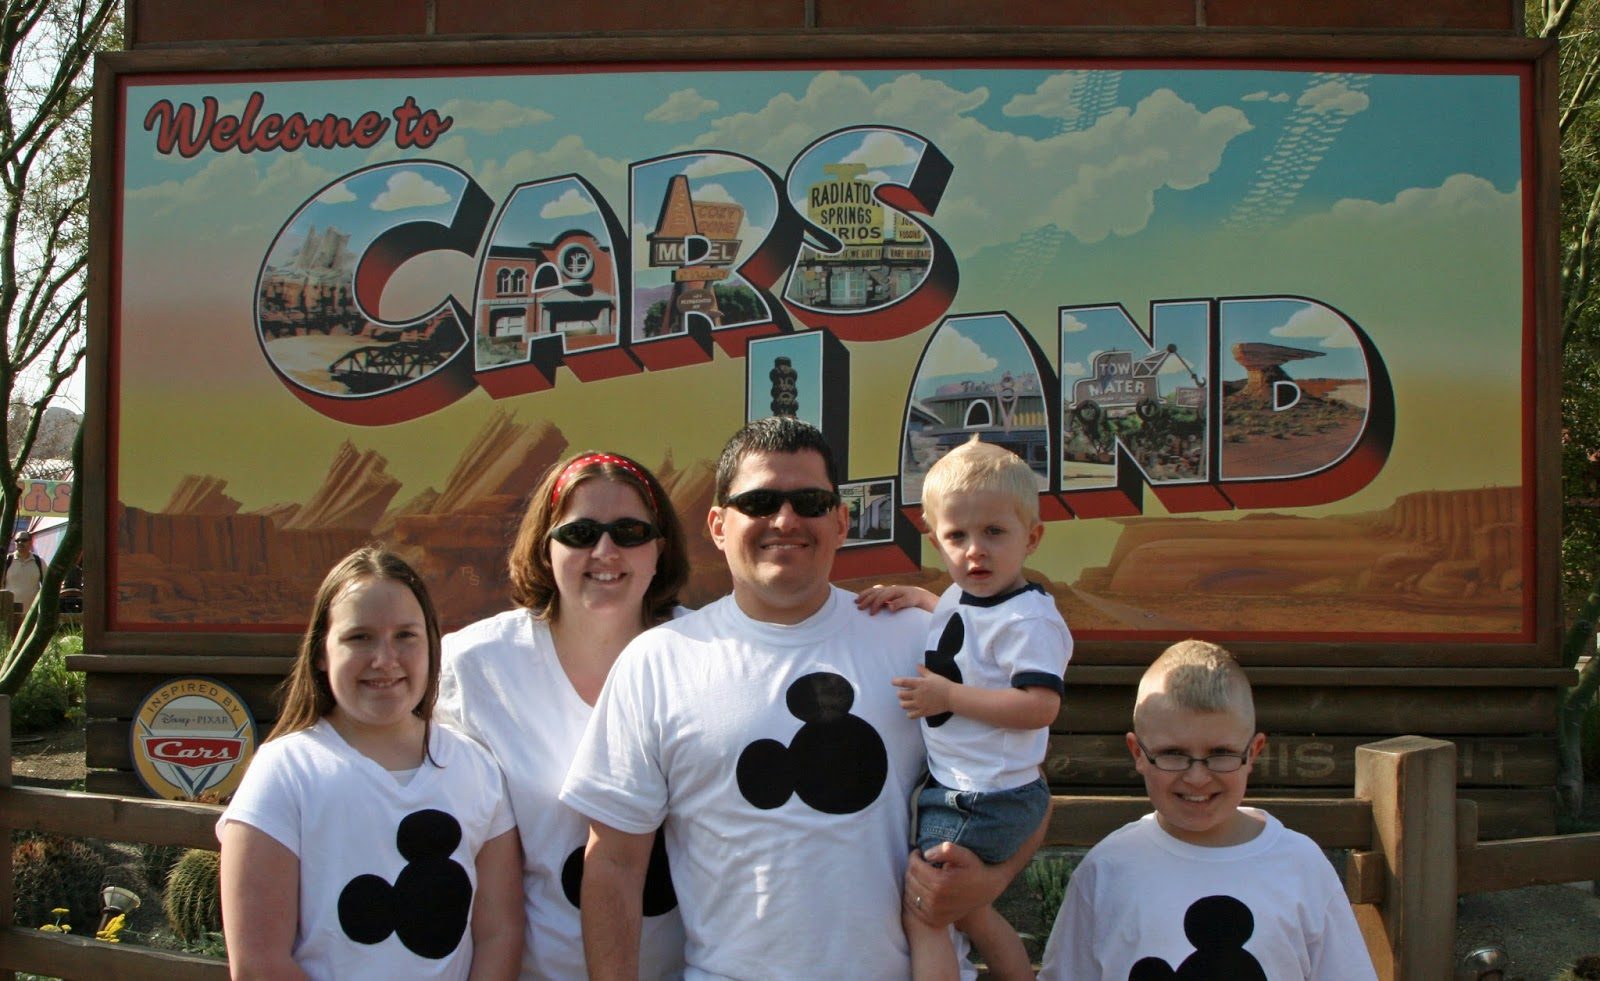 10 Iconic Photo Locations in Disneyland from LoveOurDisney.com